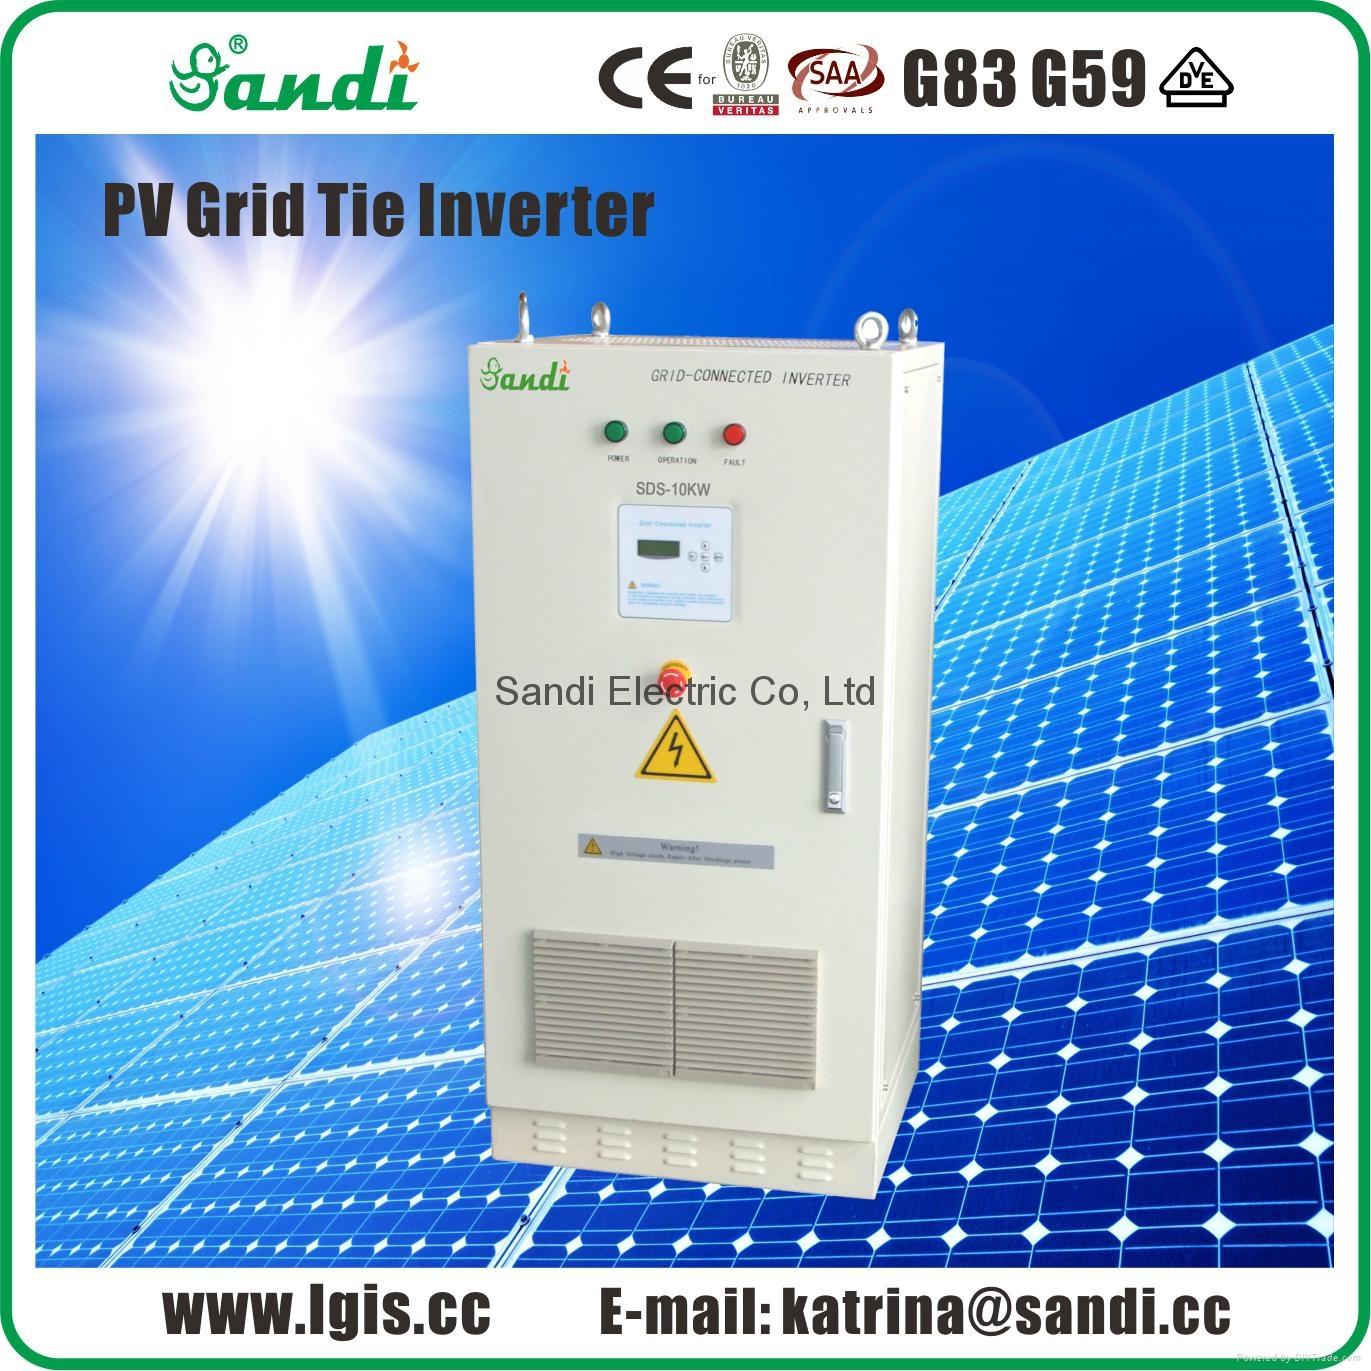 6KW太陽能並網逆變器-三相380V輸出